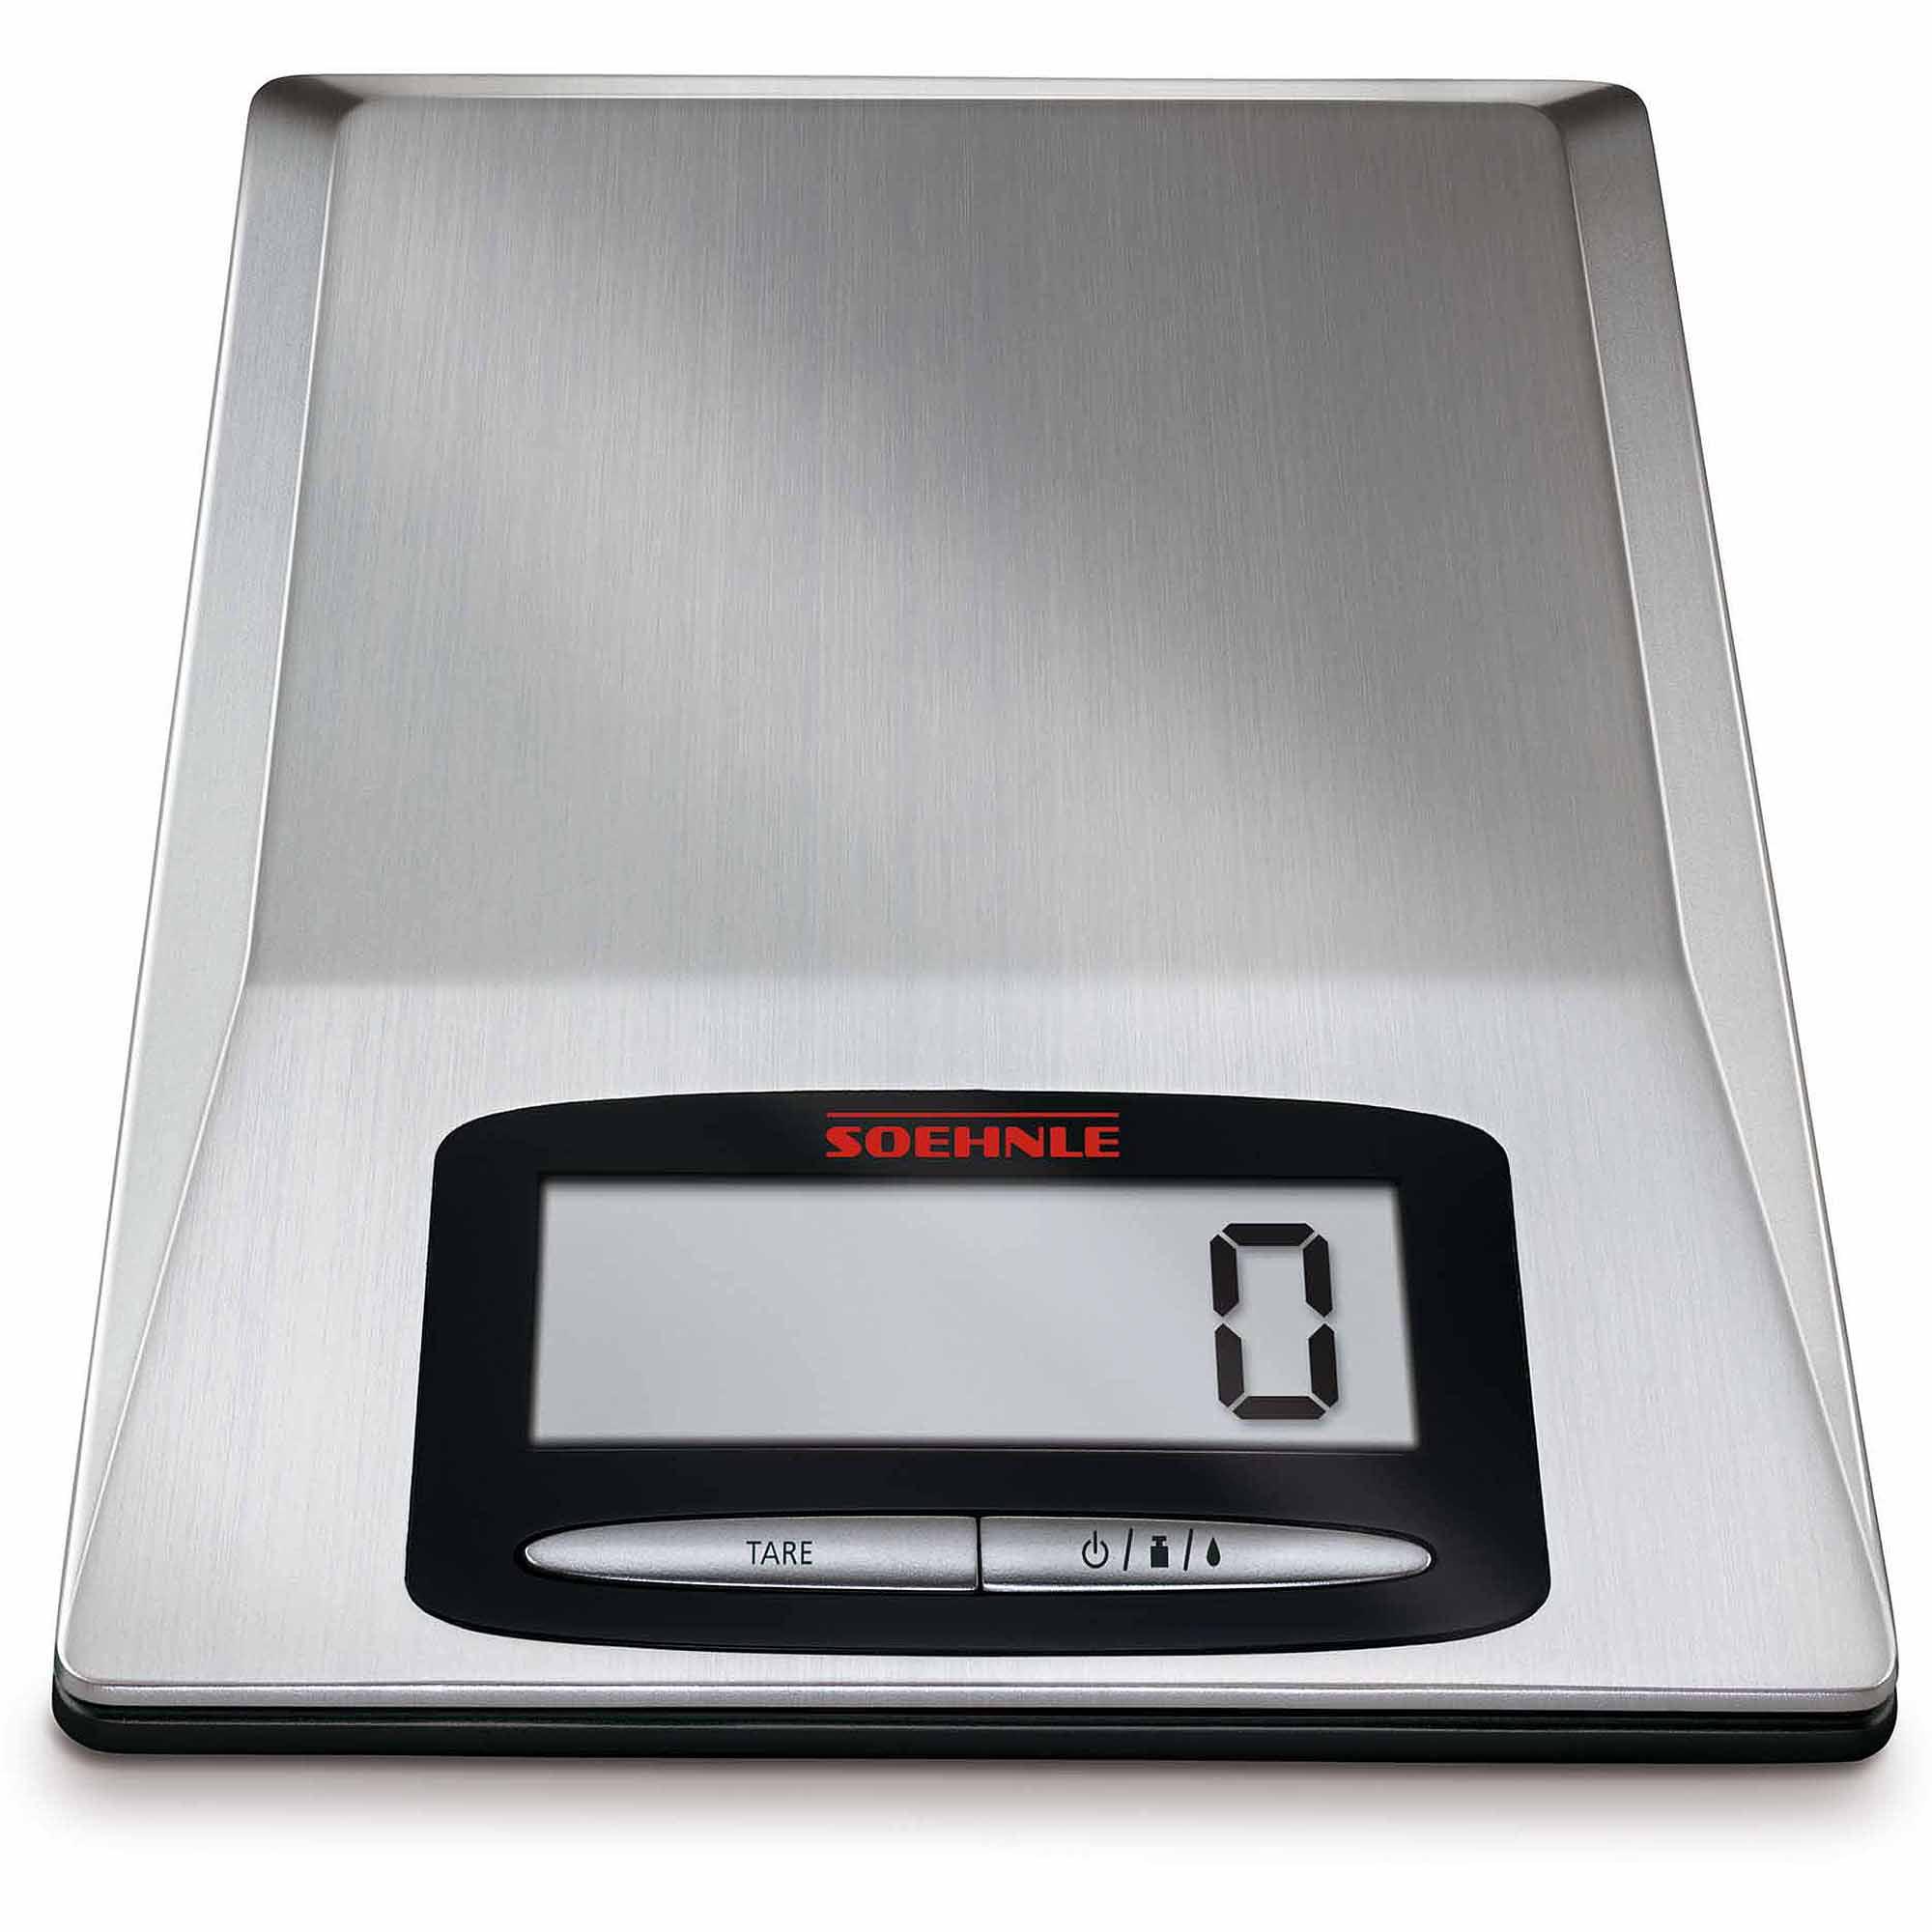 Soehnle OPTICA Precision Digital Food Scale, 9 Lb Capacity, Silver    Walmart.com